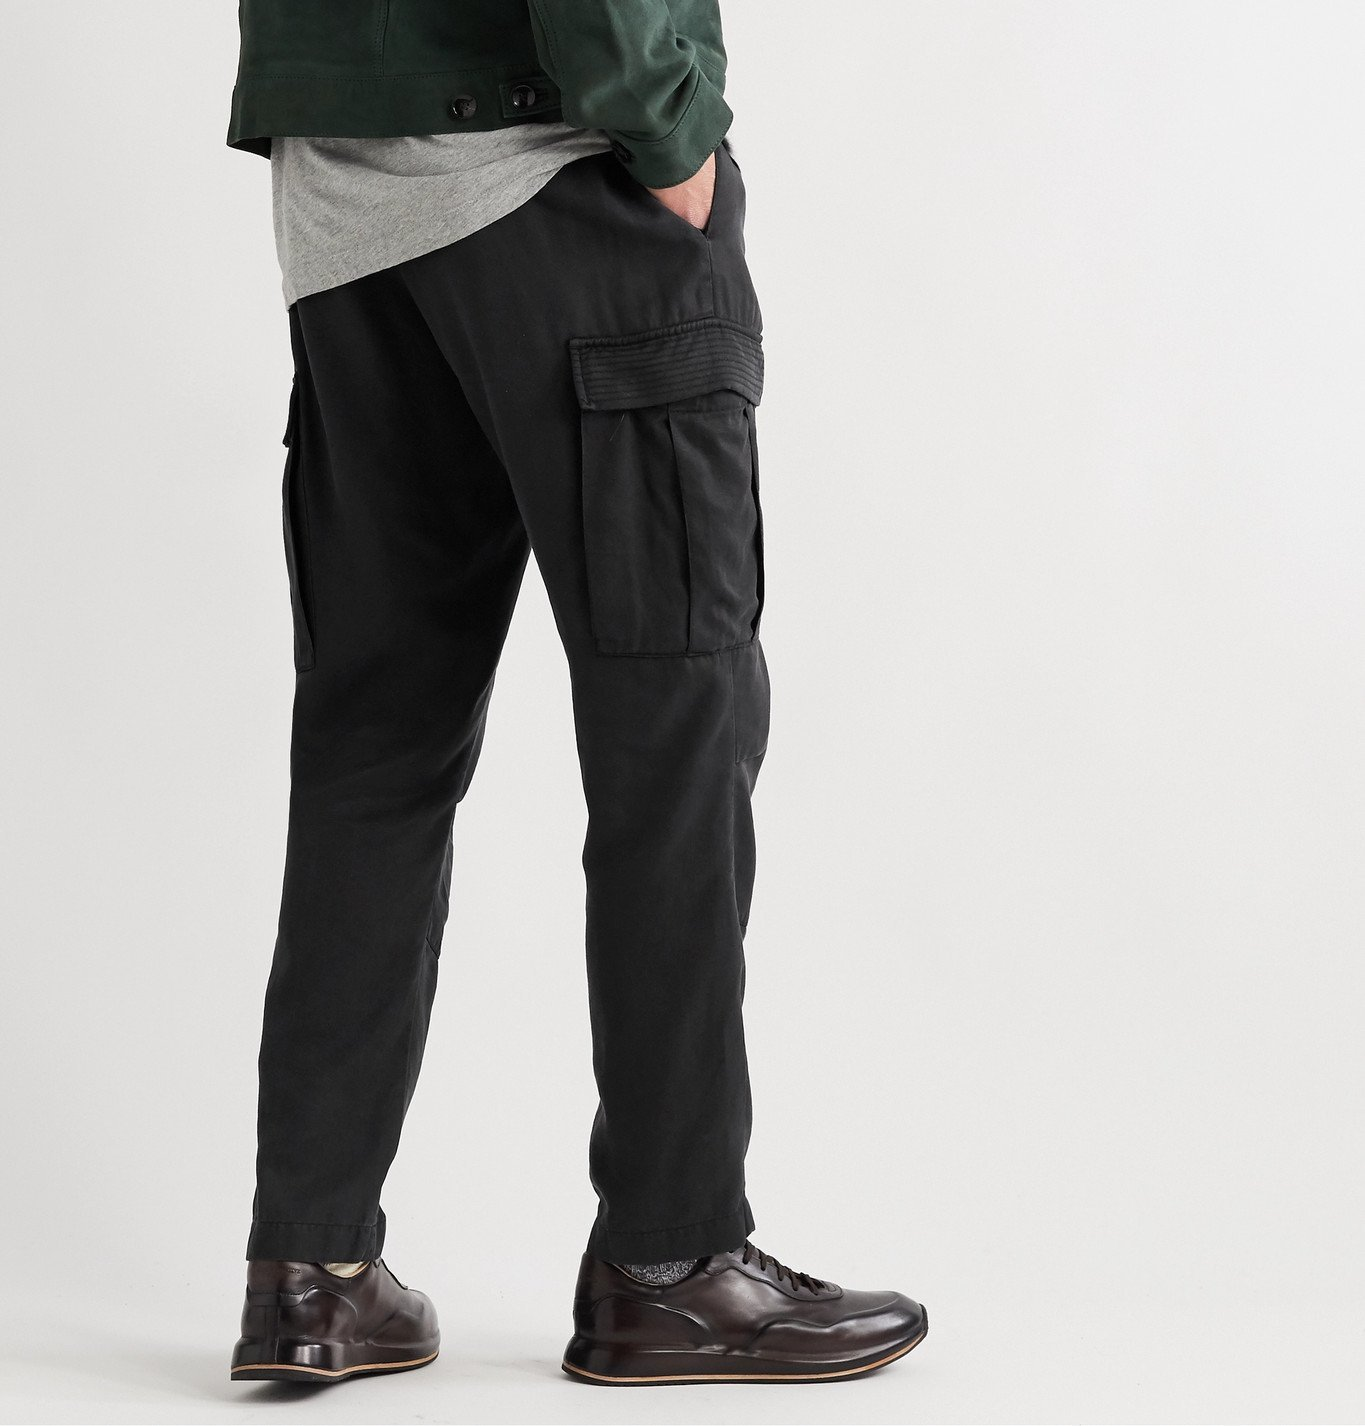 Officine Generale - Jay Garment-Dyed Tencel Drawstring Cargo Trousers - Black